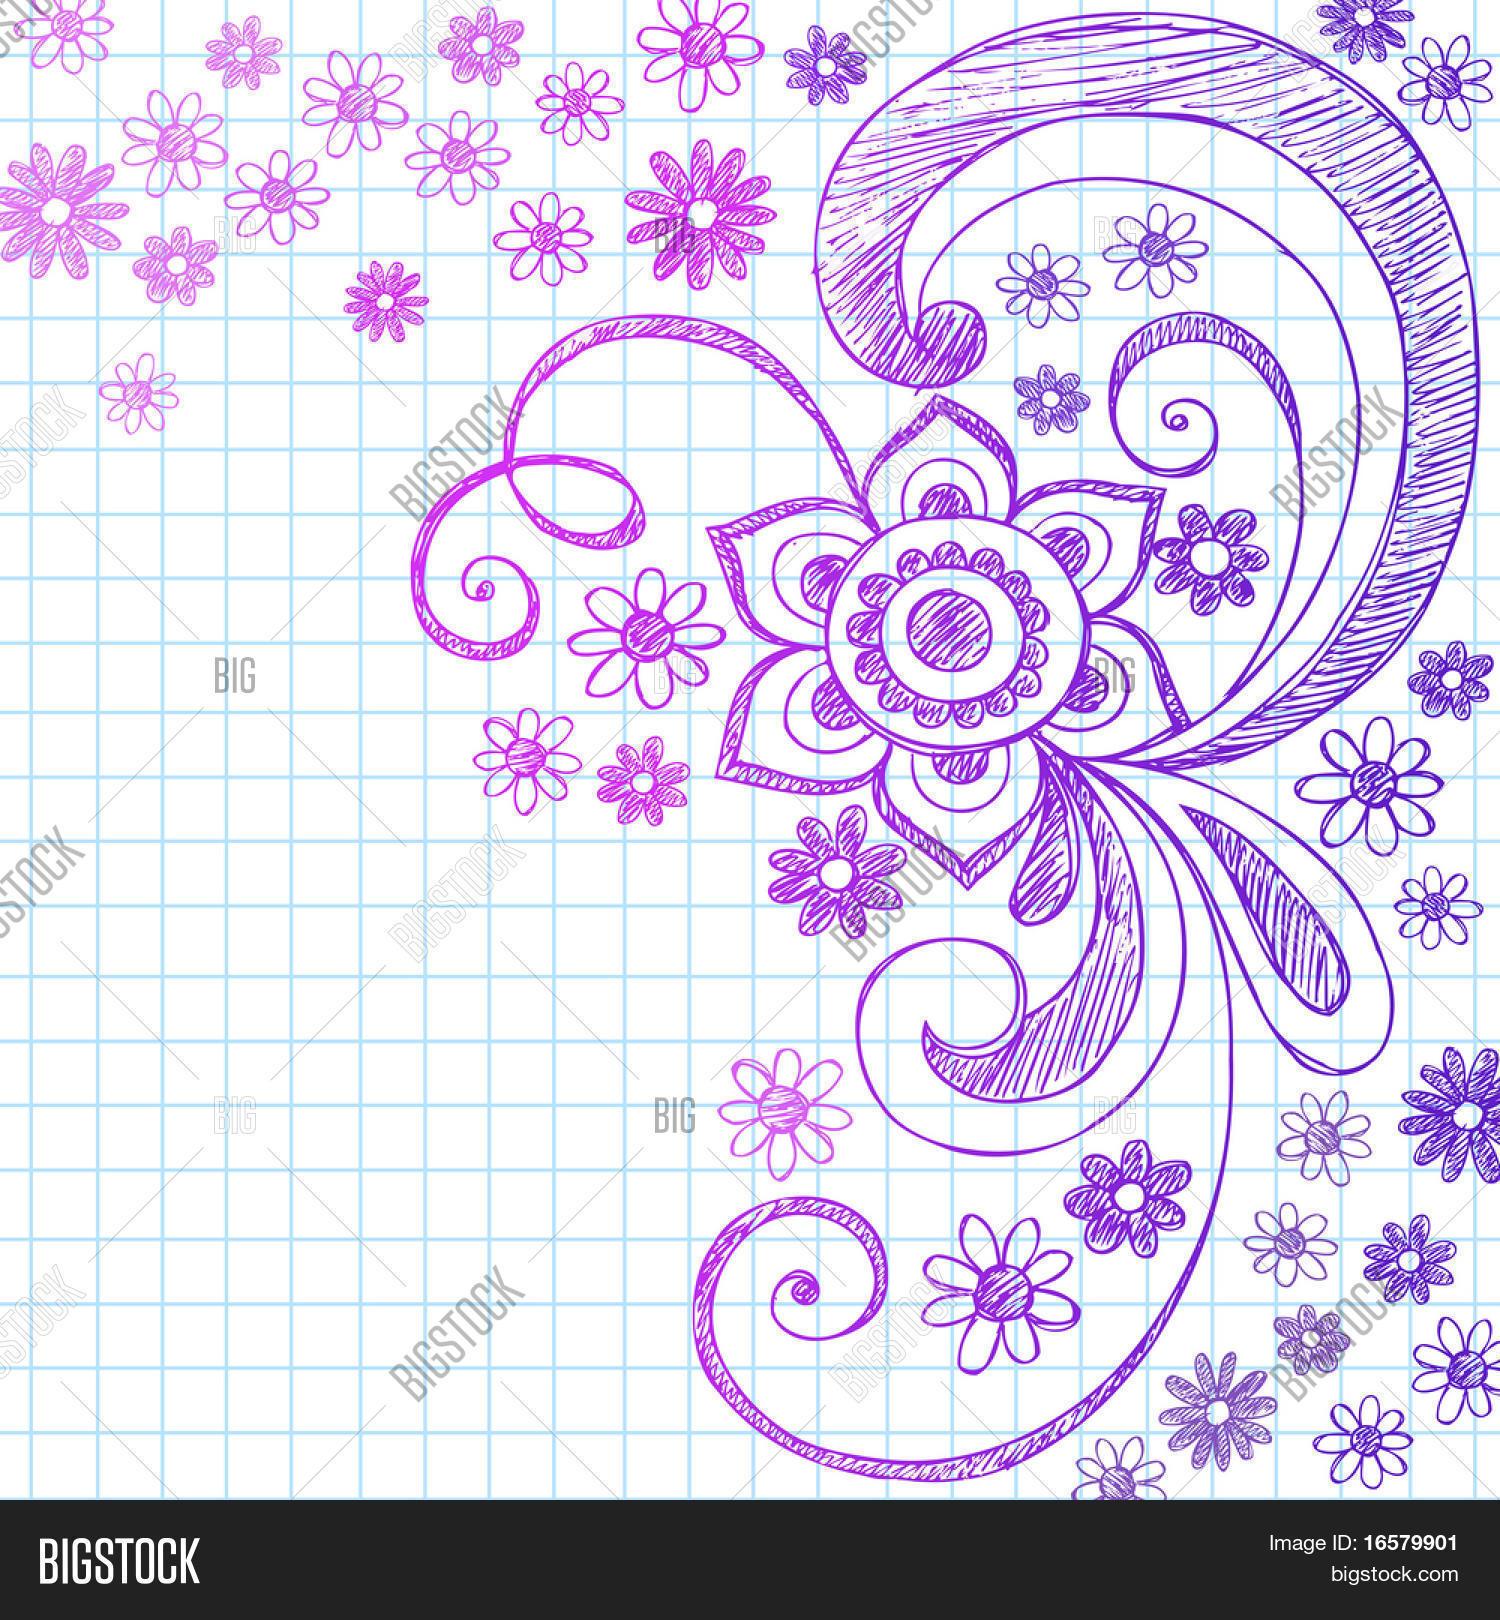 ... on Grid Notebook Paper Vector Stock Vector & Stock Photos | Bigstock